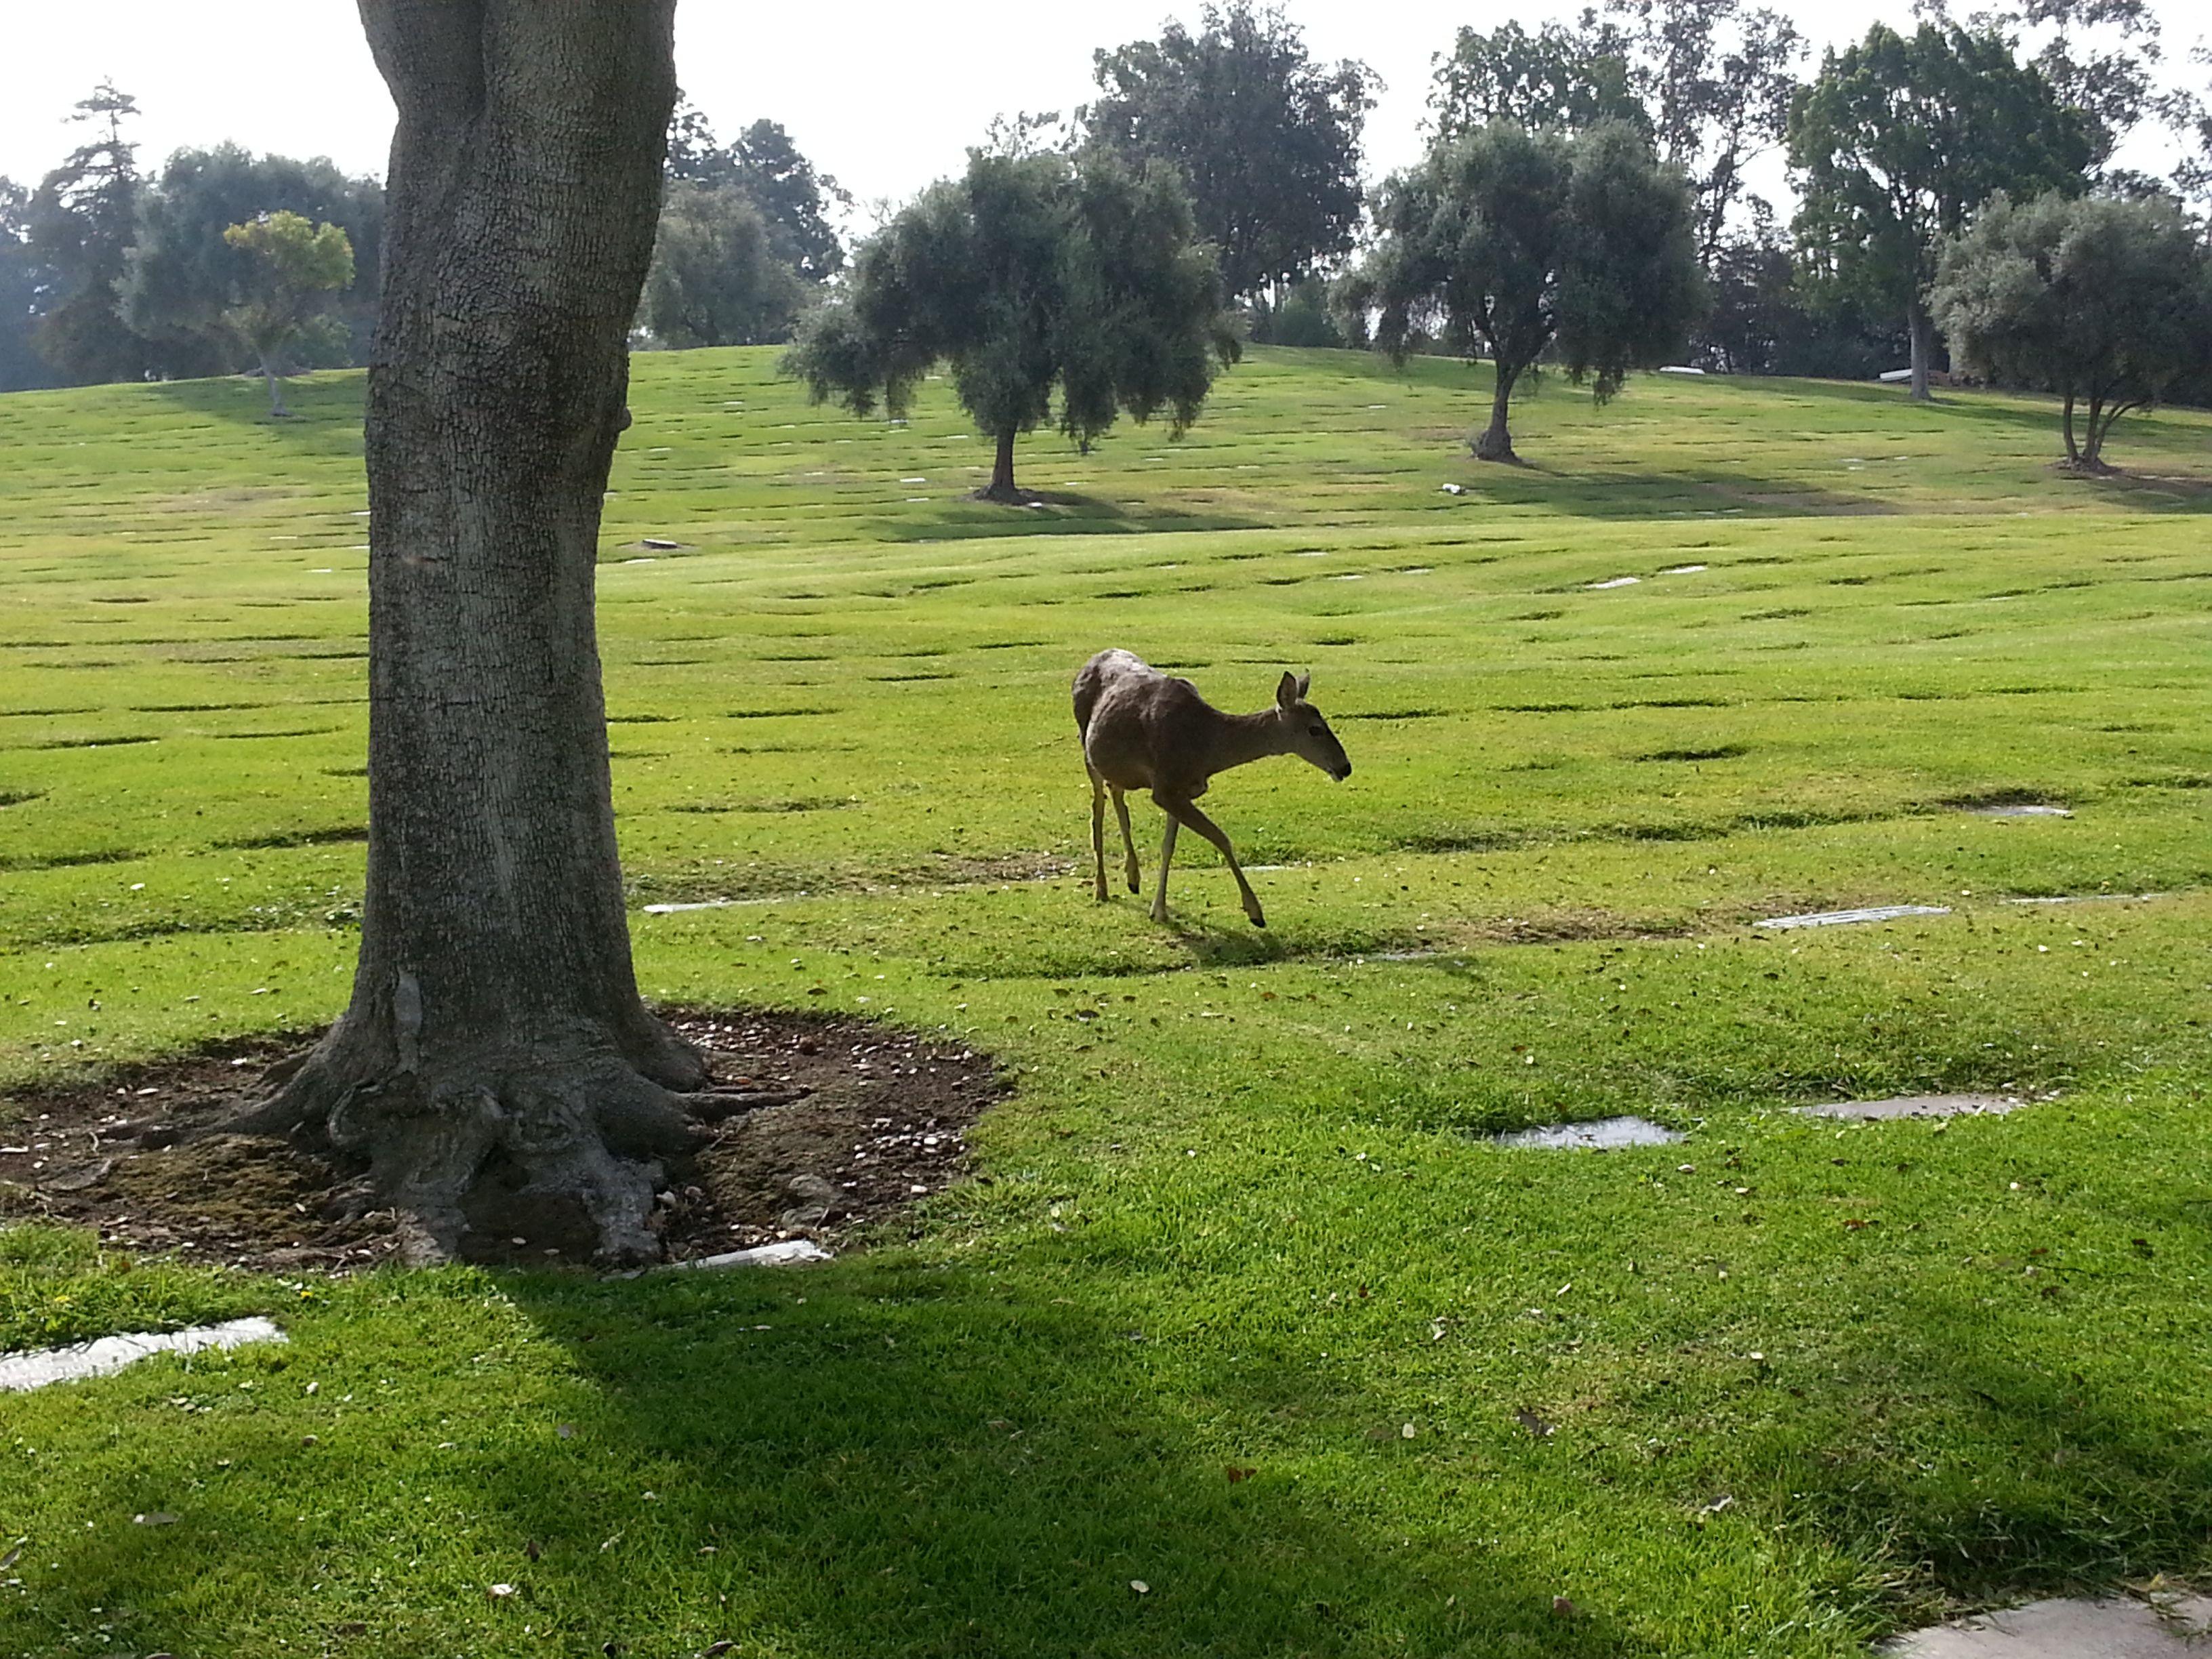 Deer Grazing Near Gate 17 Of Rose Hills Memorial Park In Whittier Calif Www Rosehills Com Rose Hill Memorial Park Whittier California